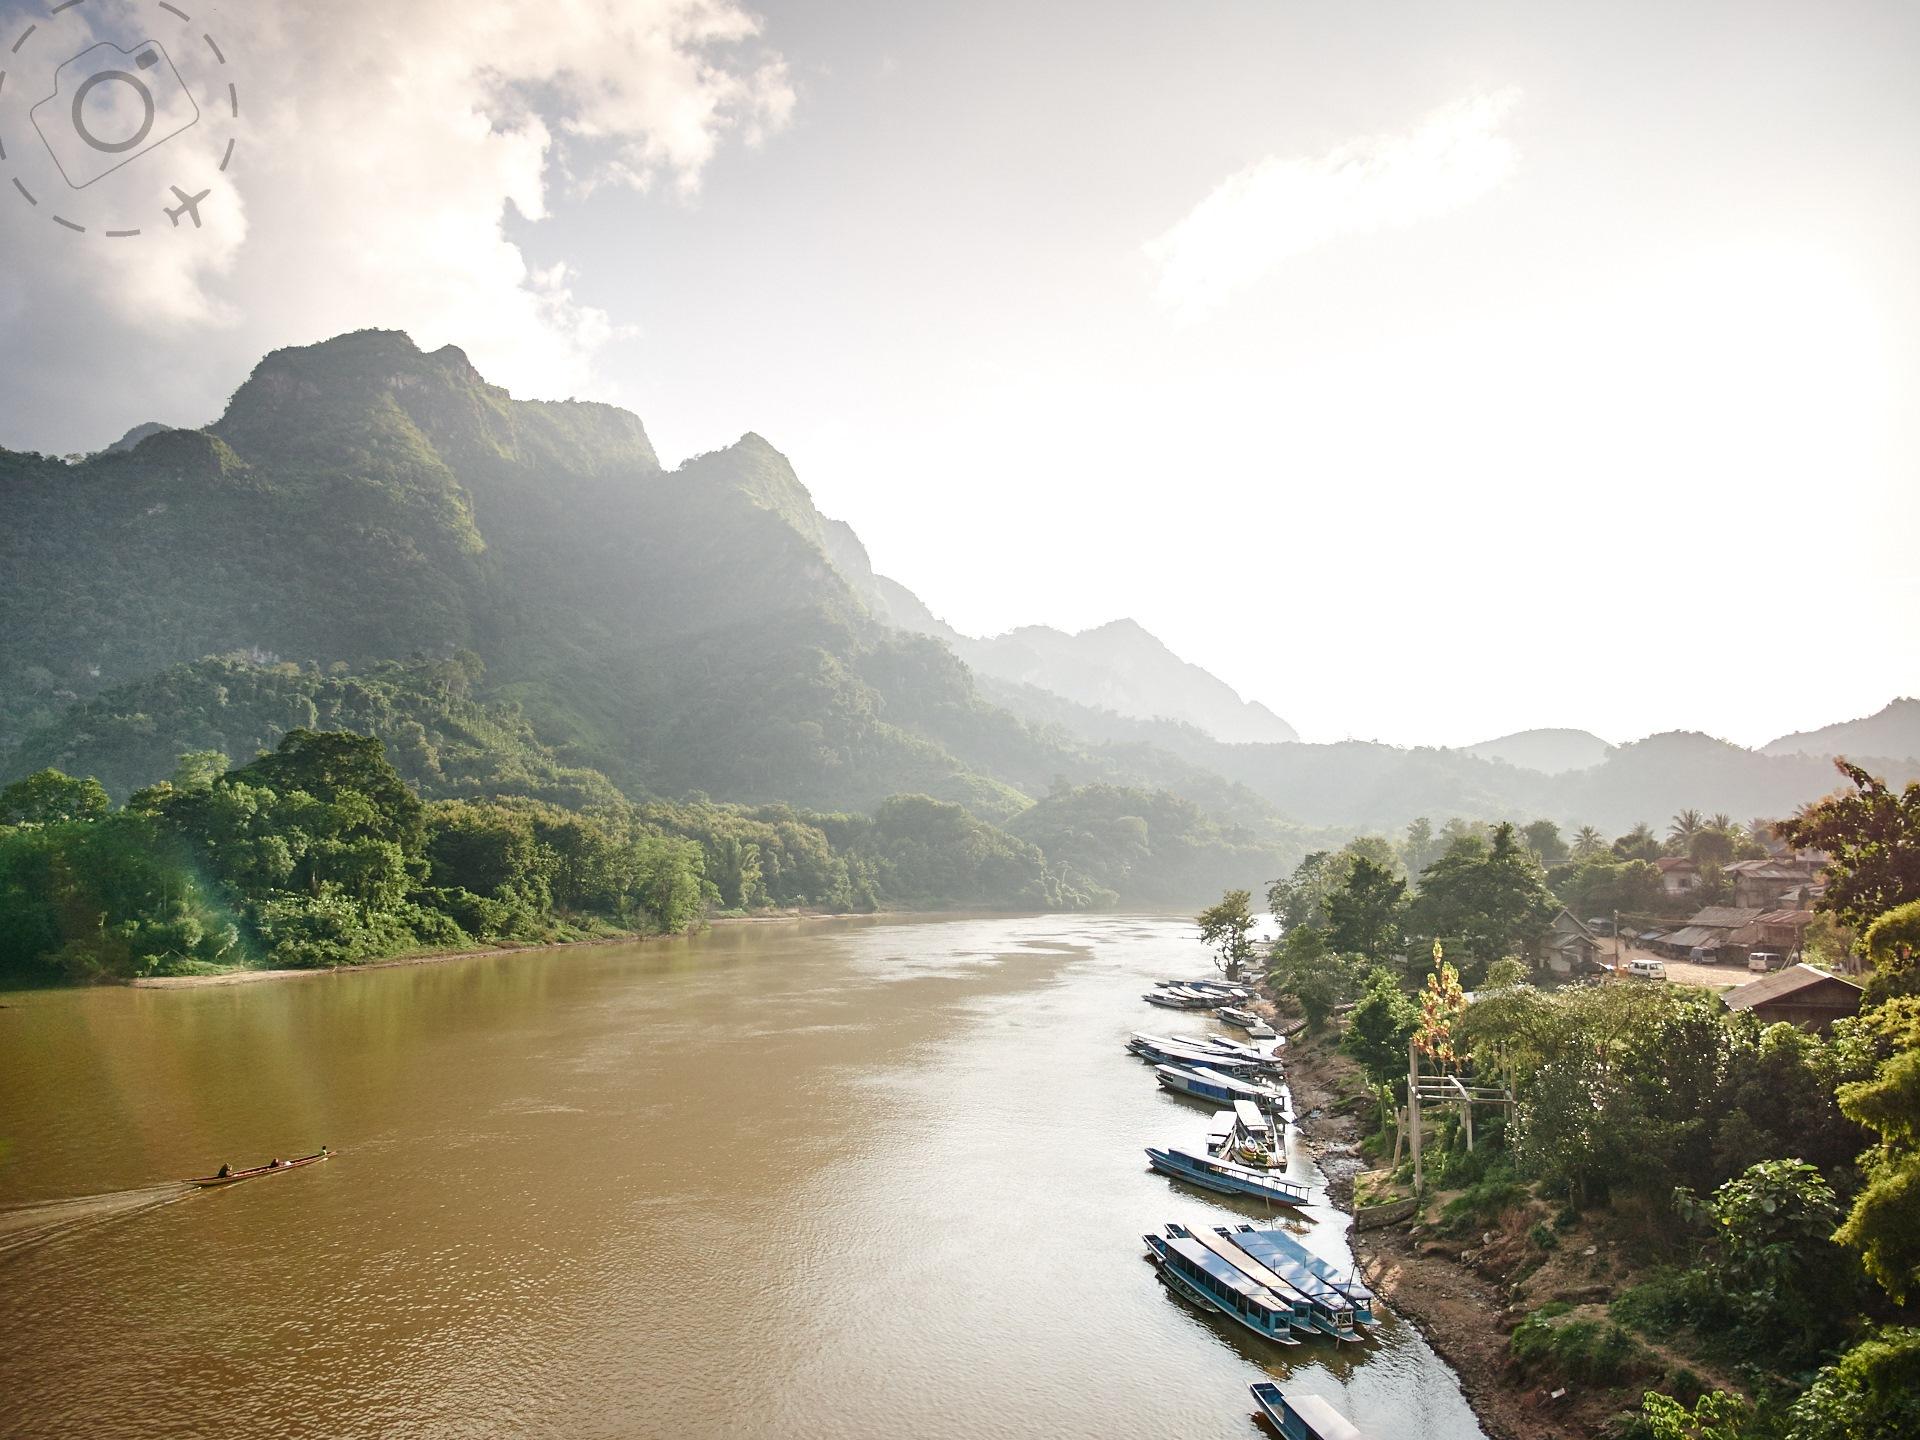 Luang Prabang for Photographers